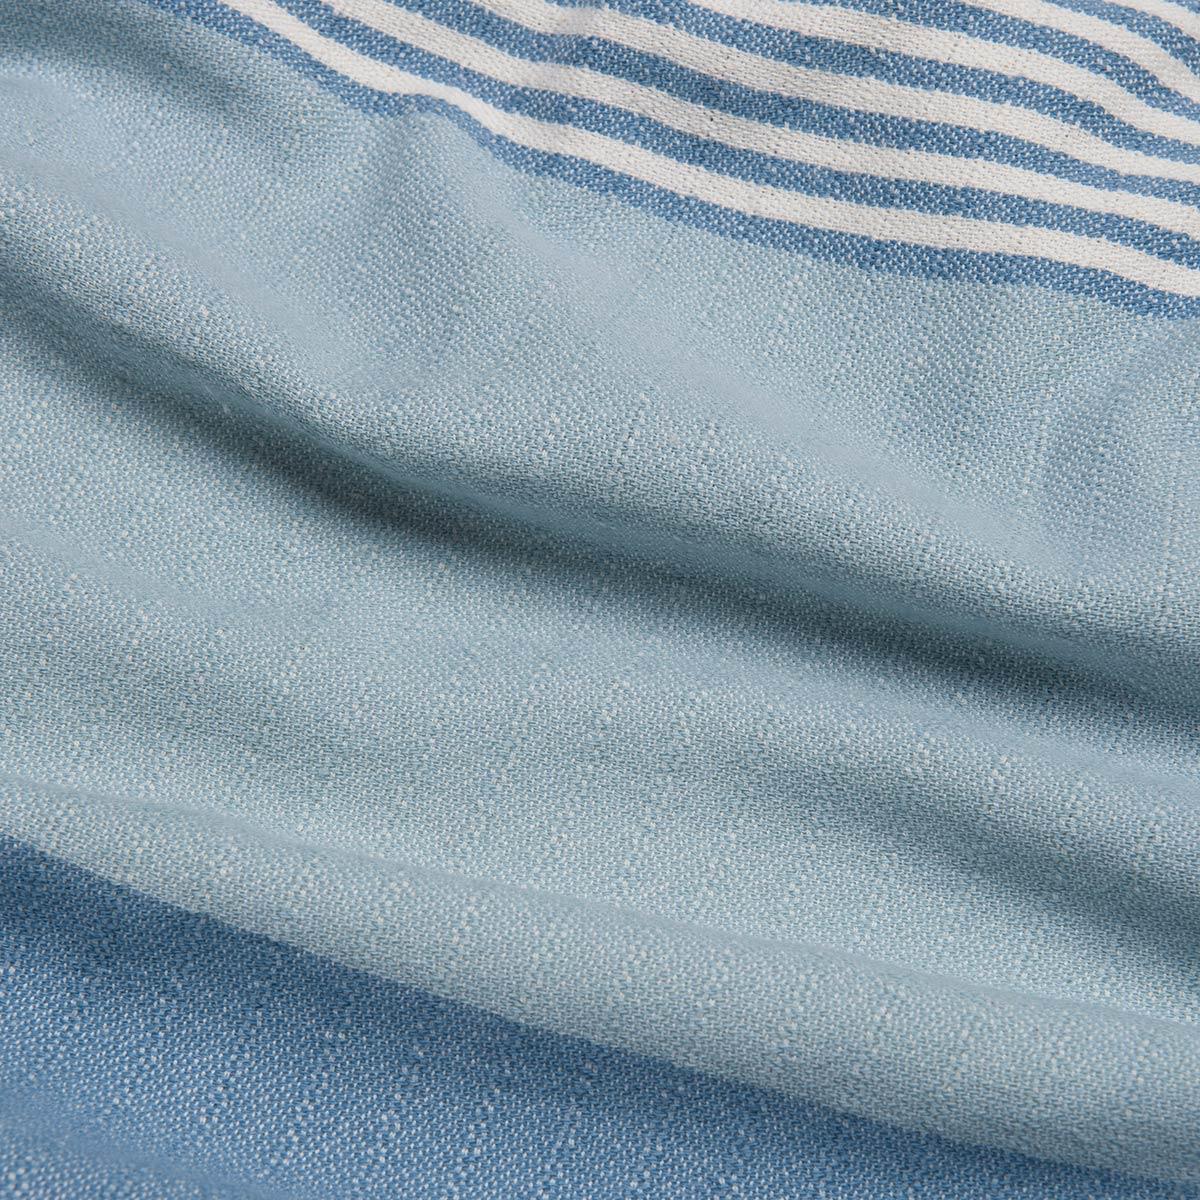 Peshtowel Twin Sultan - Air Blue / Light Blue